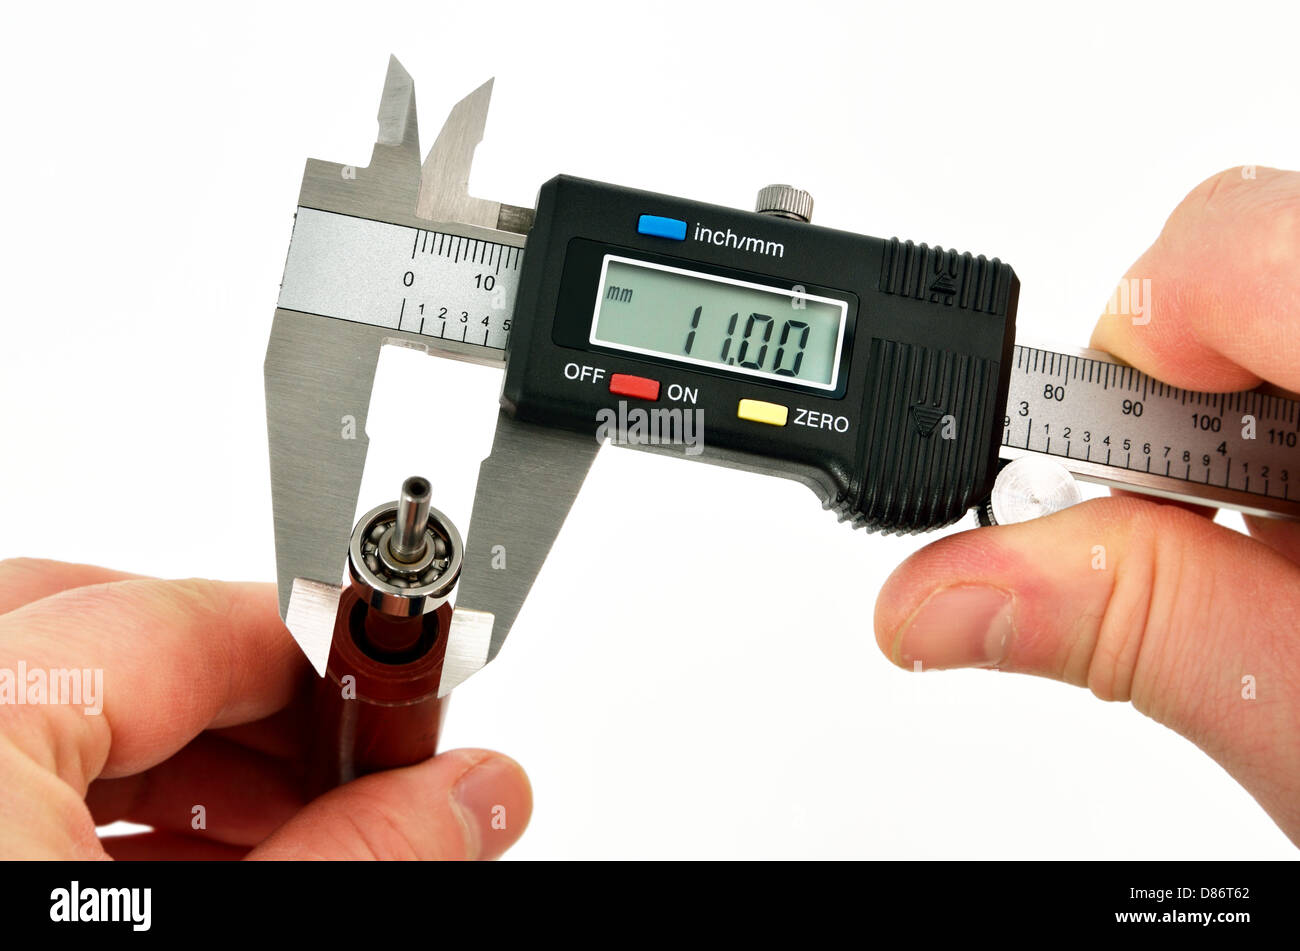 vernier caliper measurements on the bearing - Stock Image